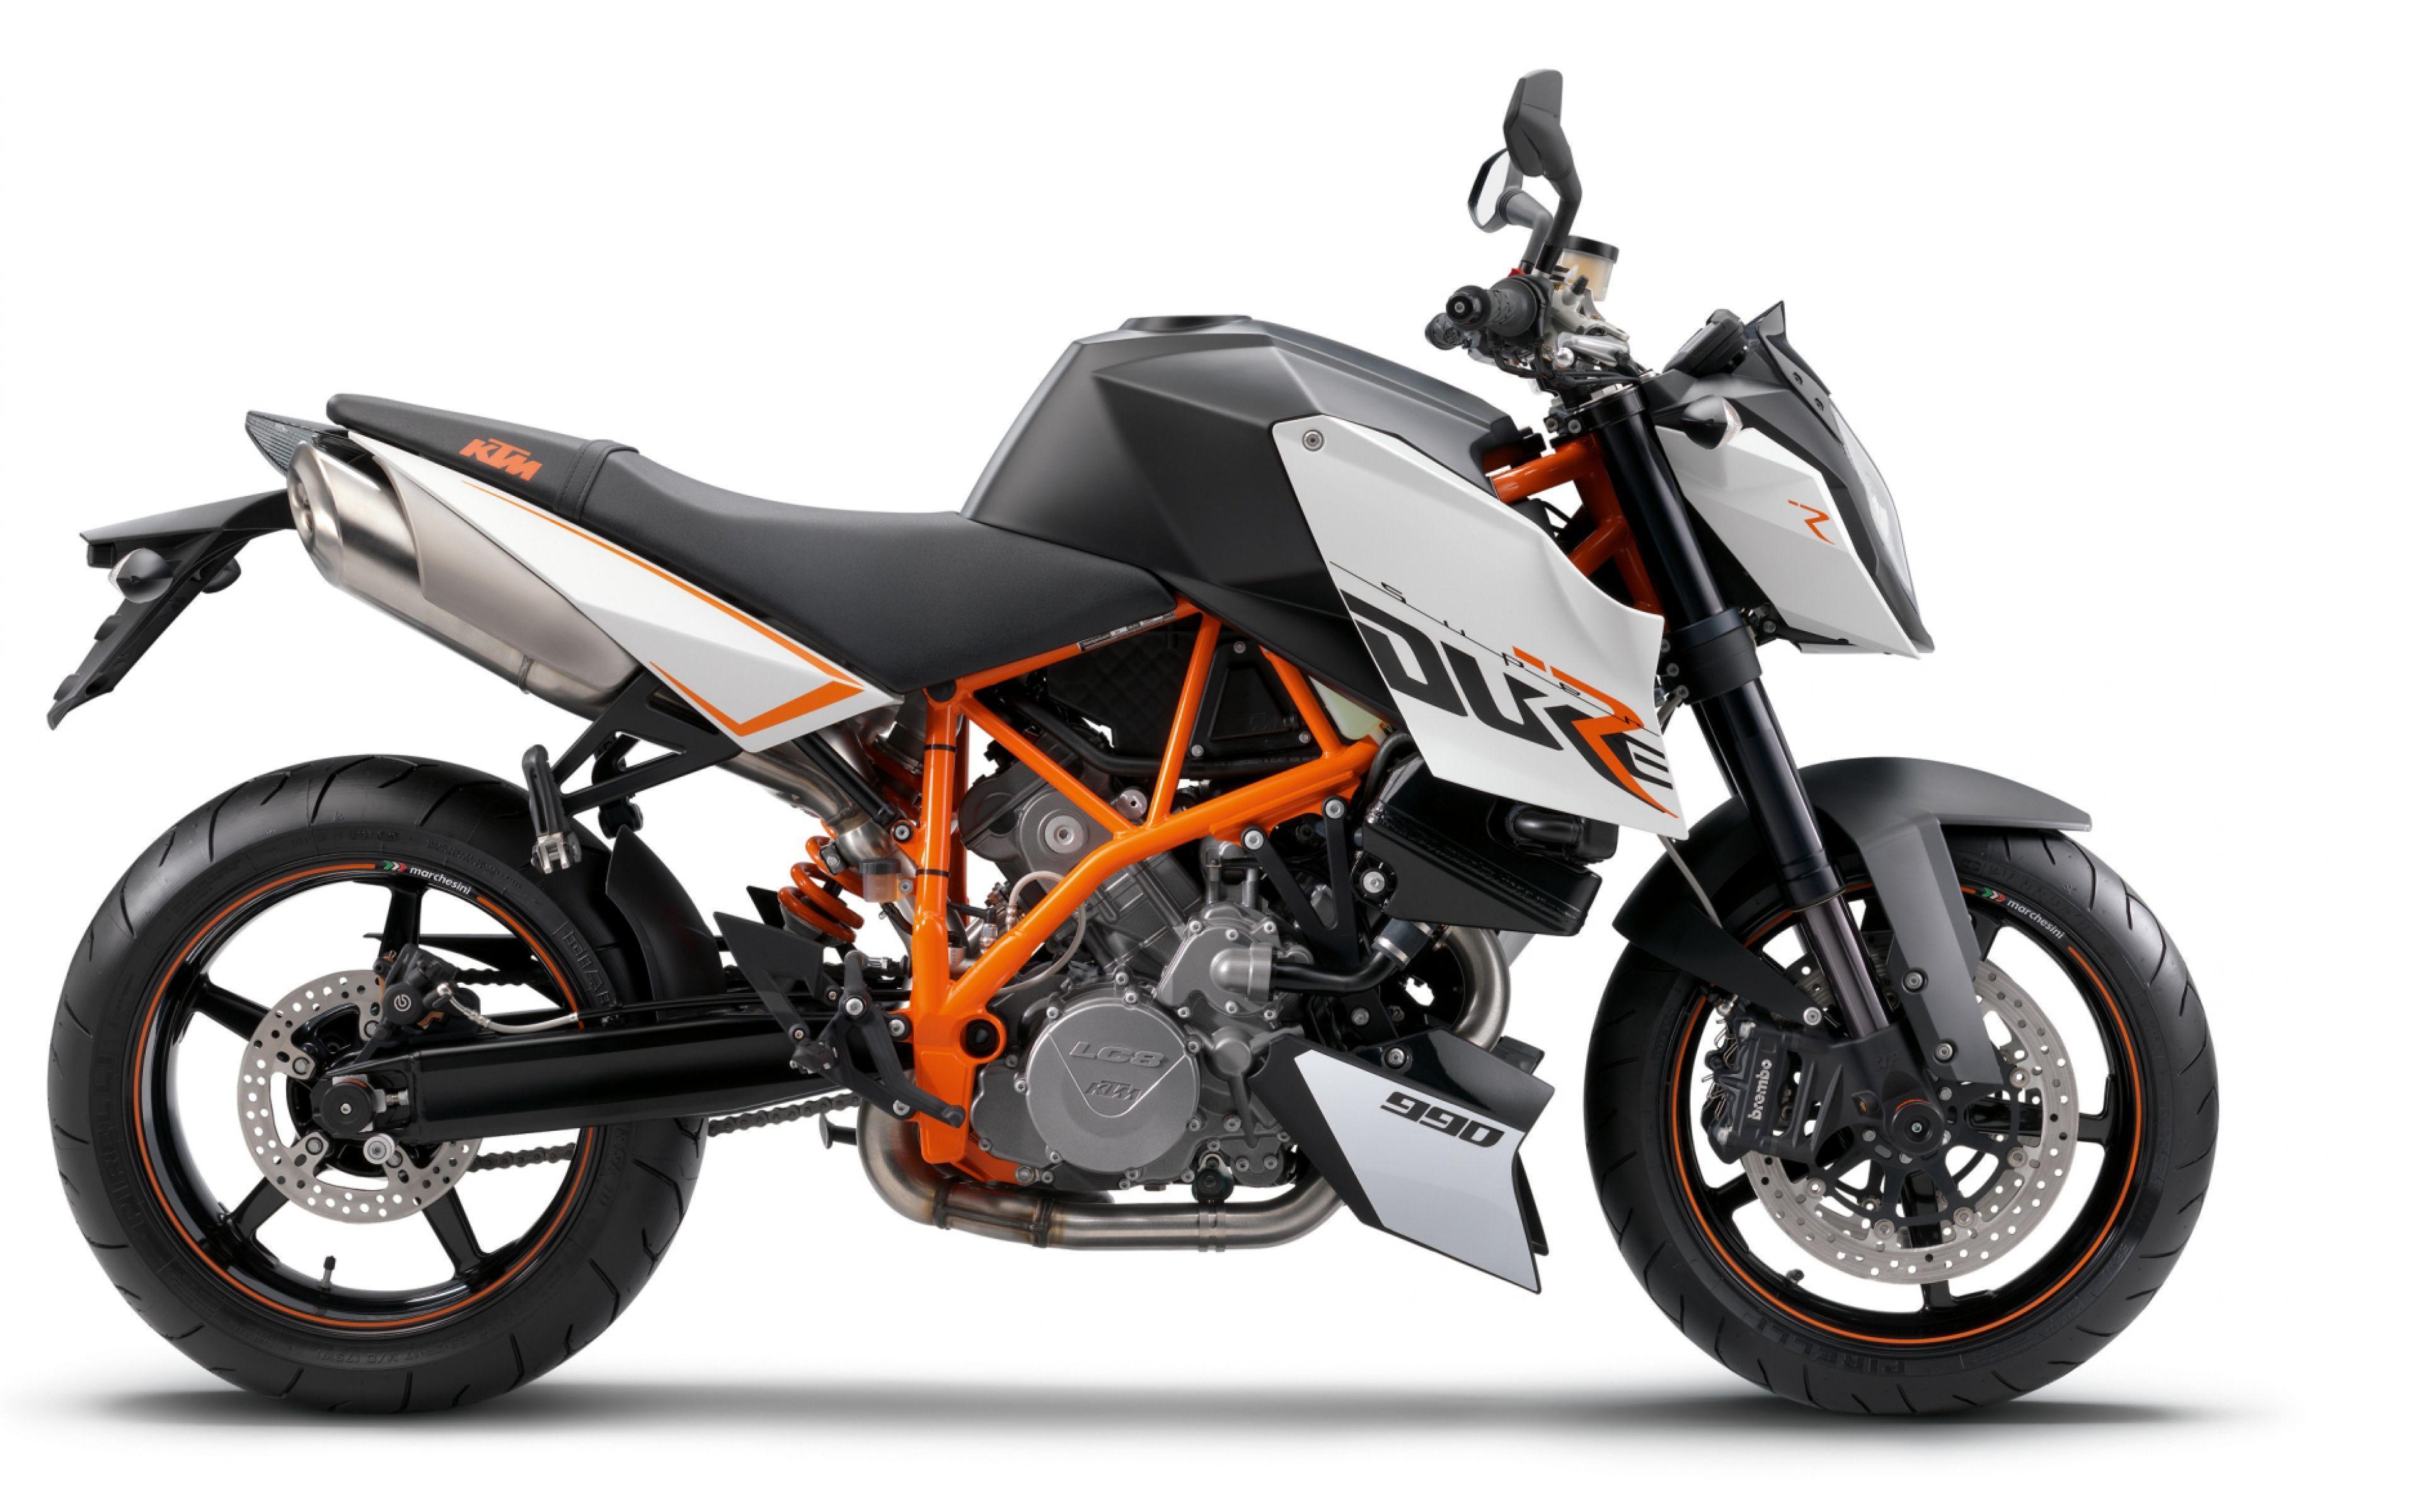 KTM Bike Wallpapers 3840x2400